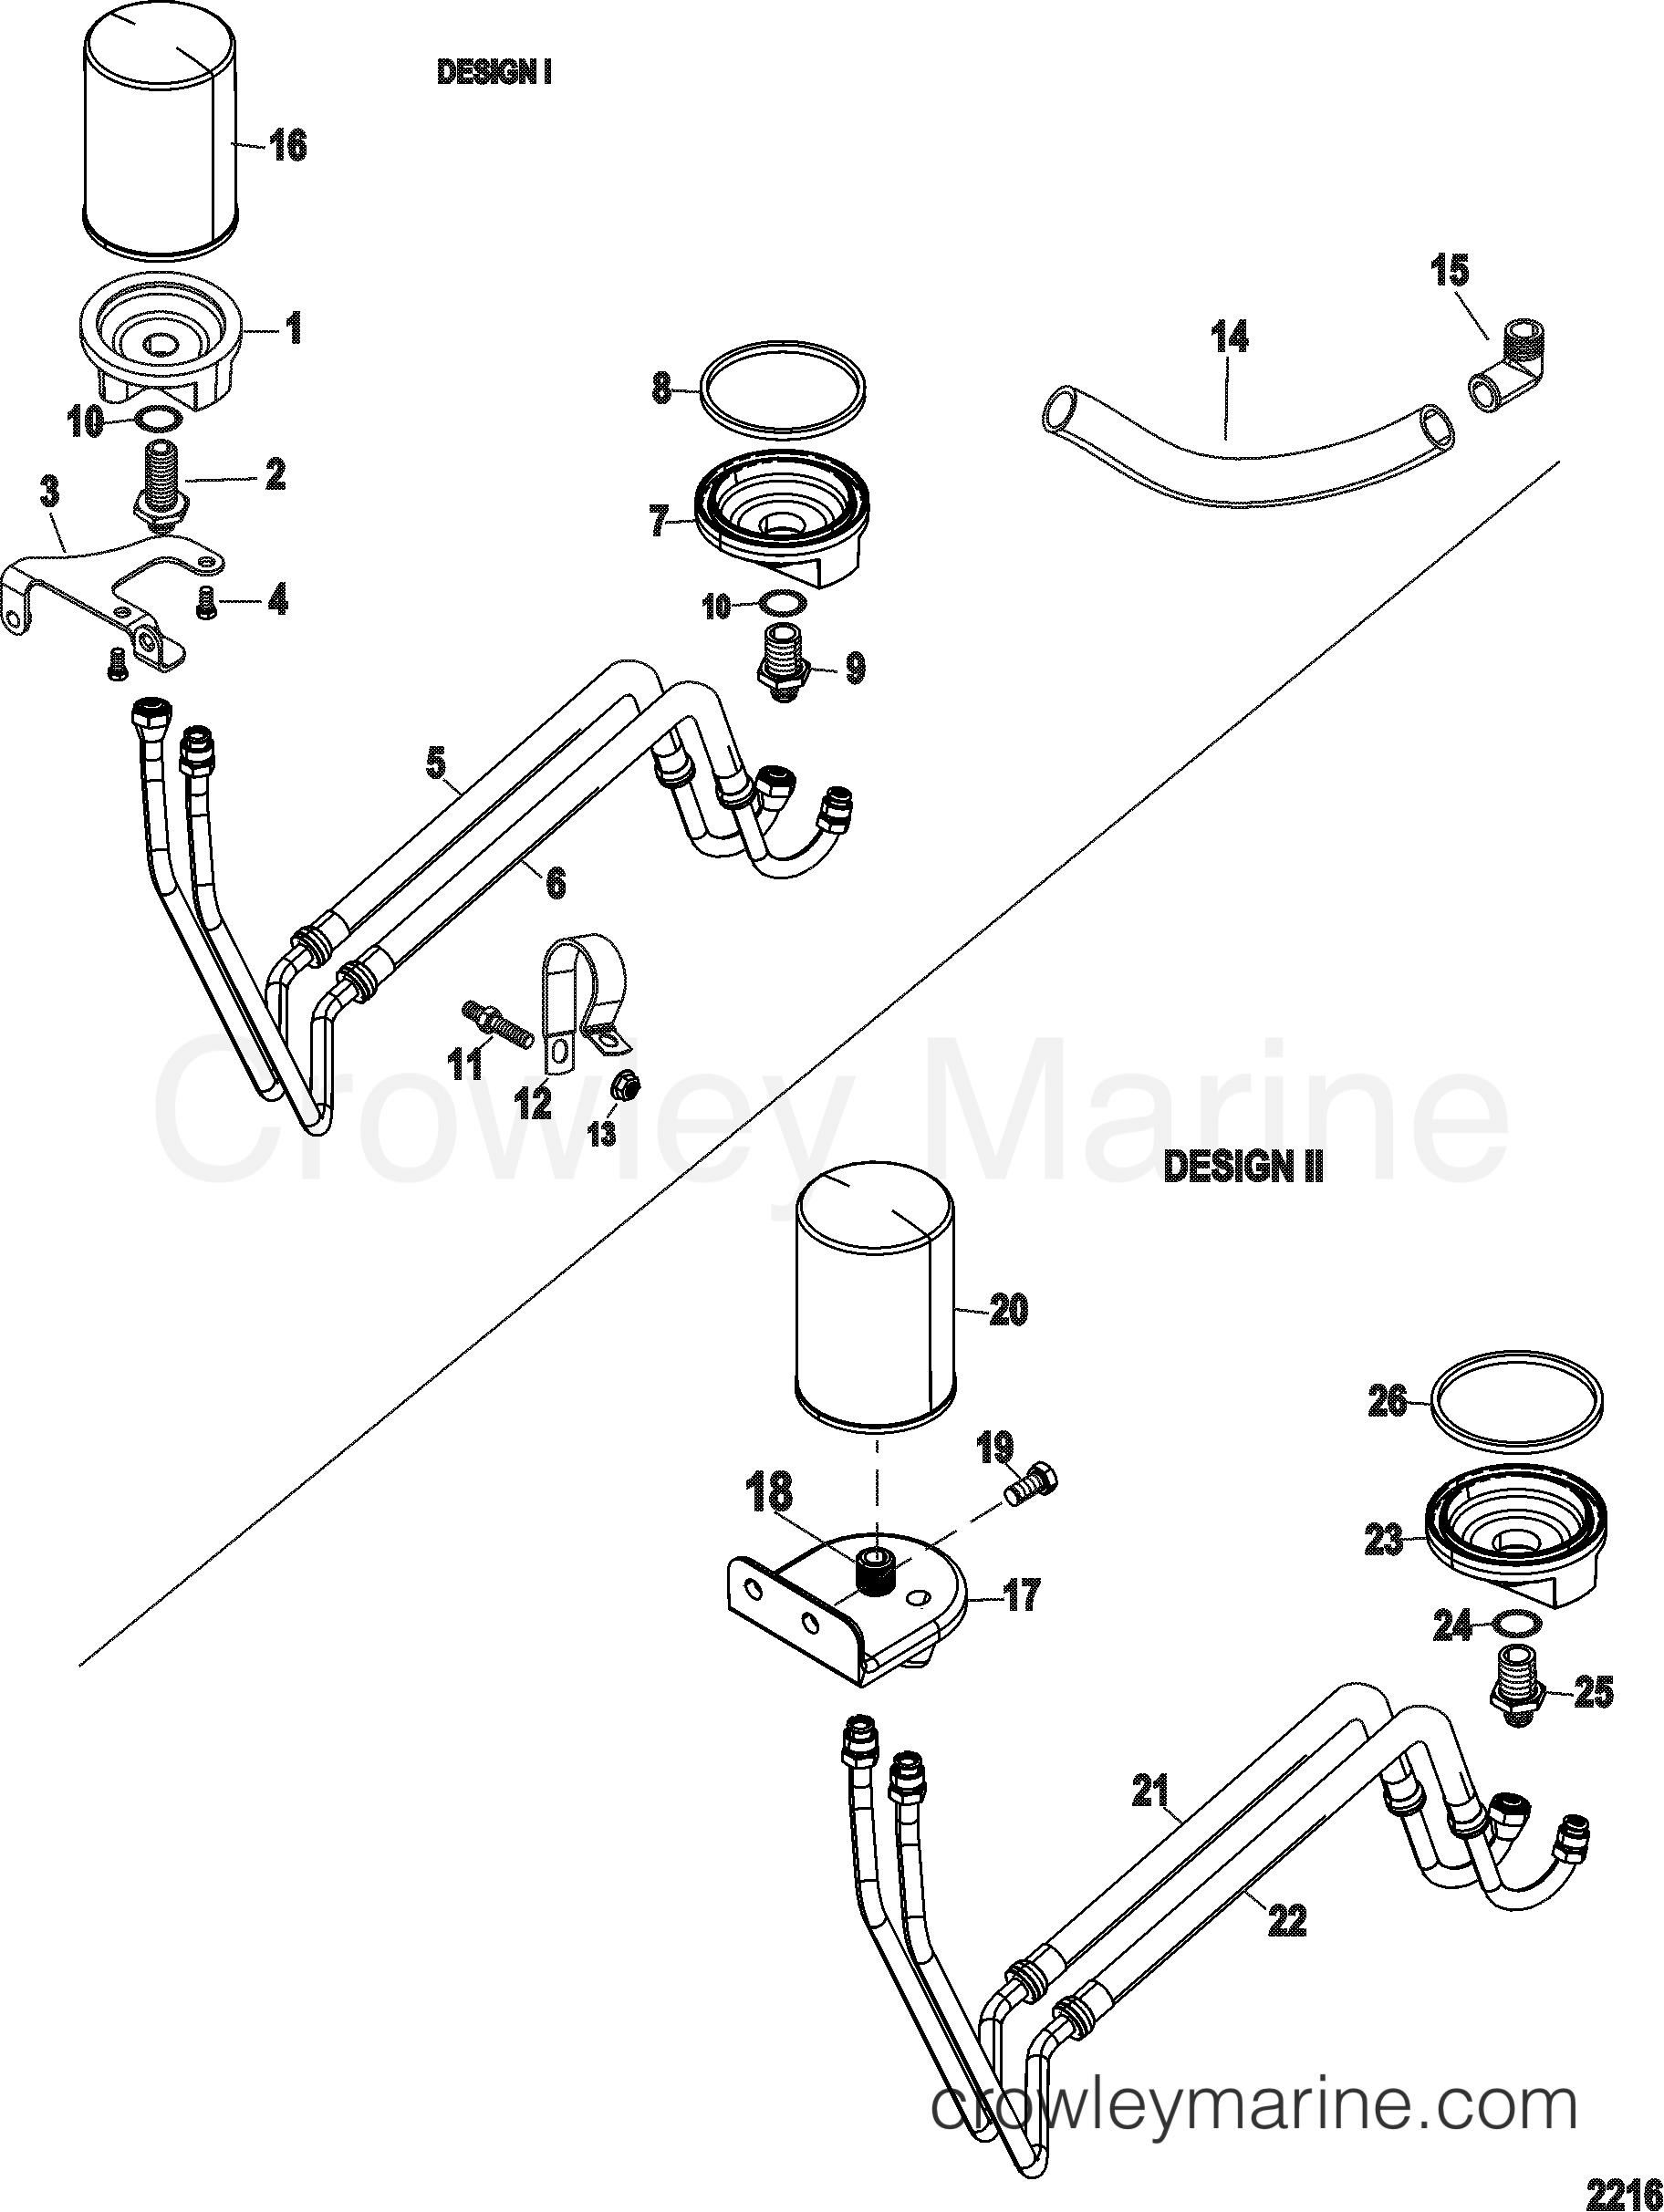 mercruiser496-mag-wiring-diagram-5 Quicksilver Generator Wiring Diagram on cummins onan, delco remy starter, briggs stratton, honda portable,